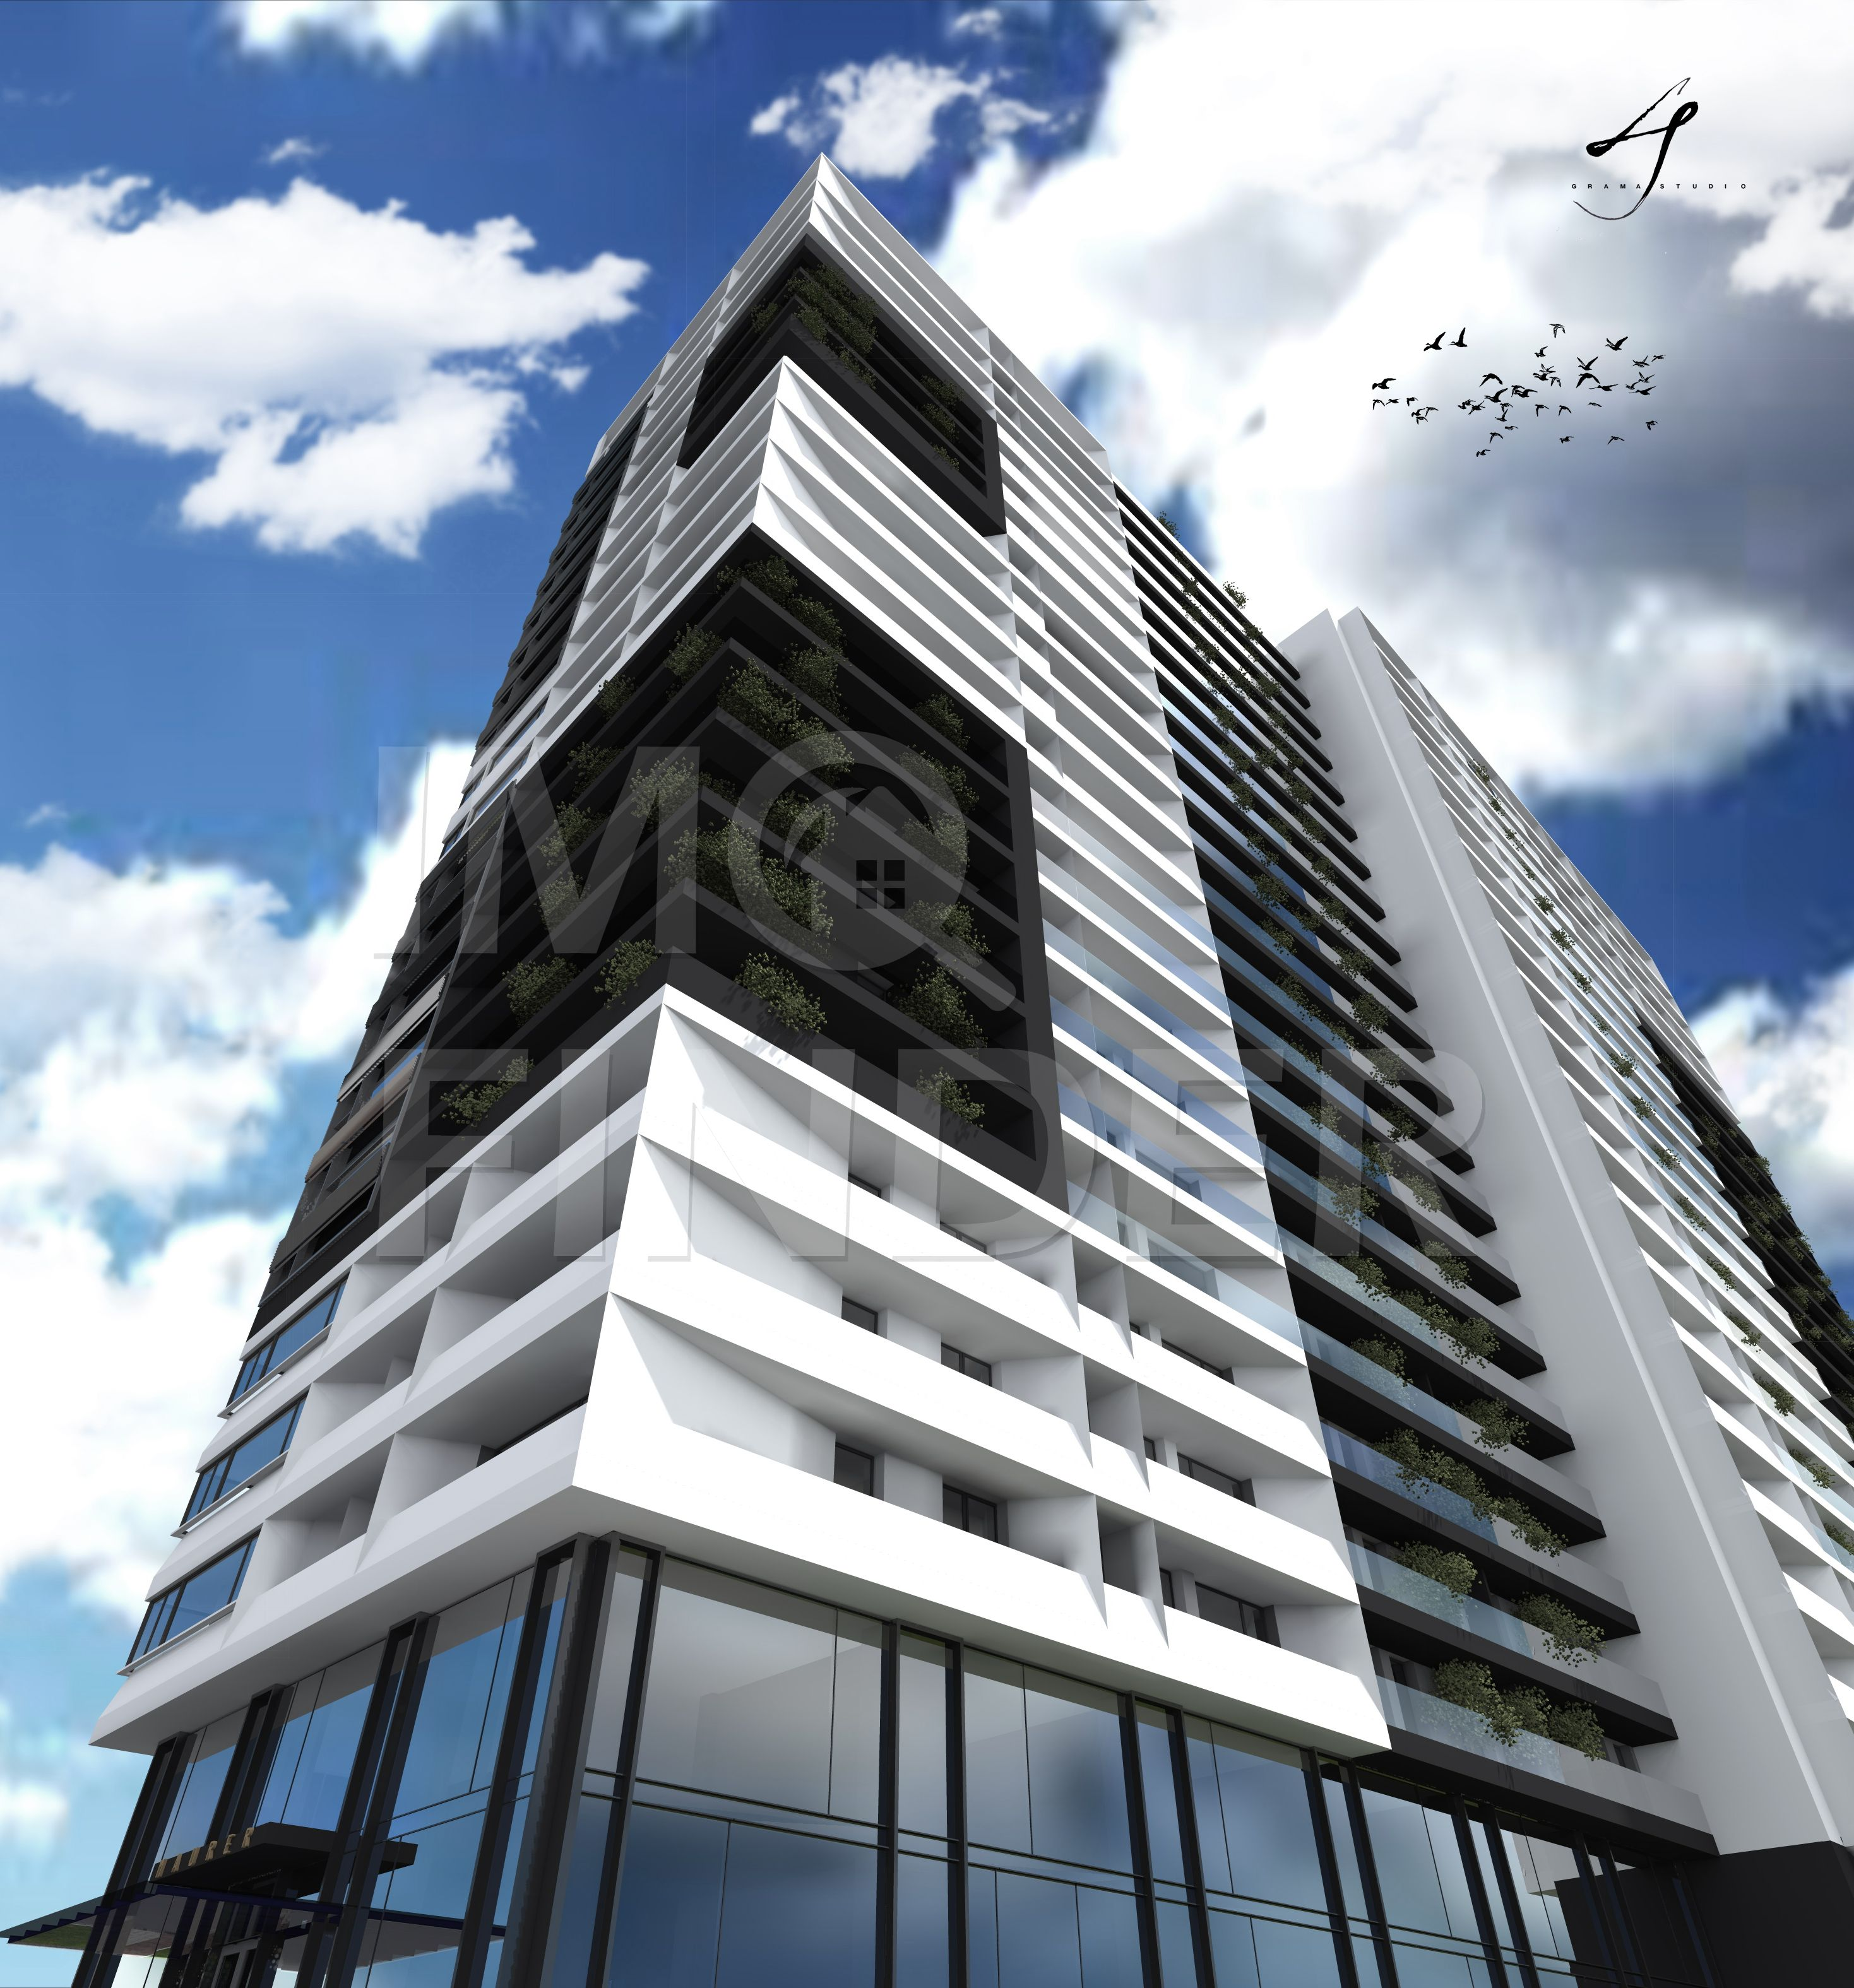 Vanzare apartamente, 2, 3, 4 camere, Maurer Residence, Piata Abator